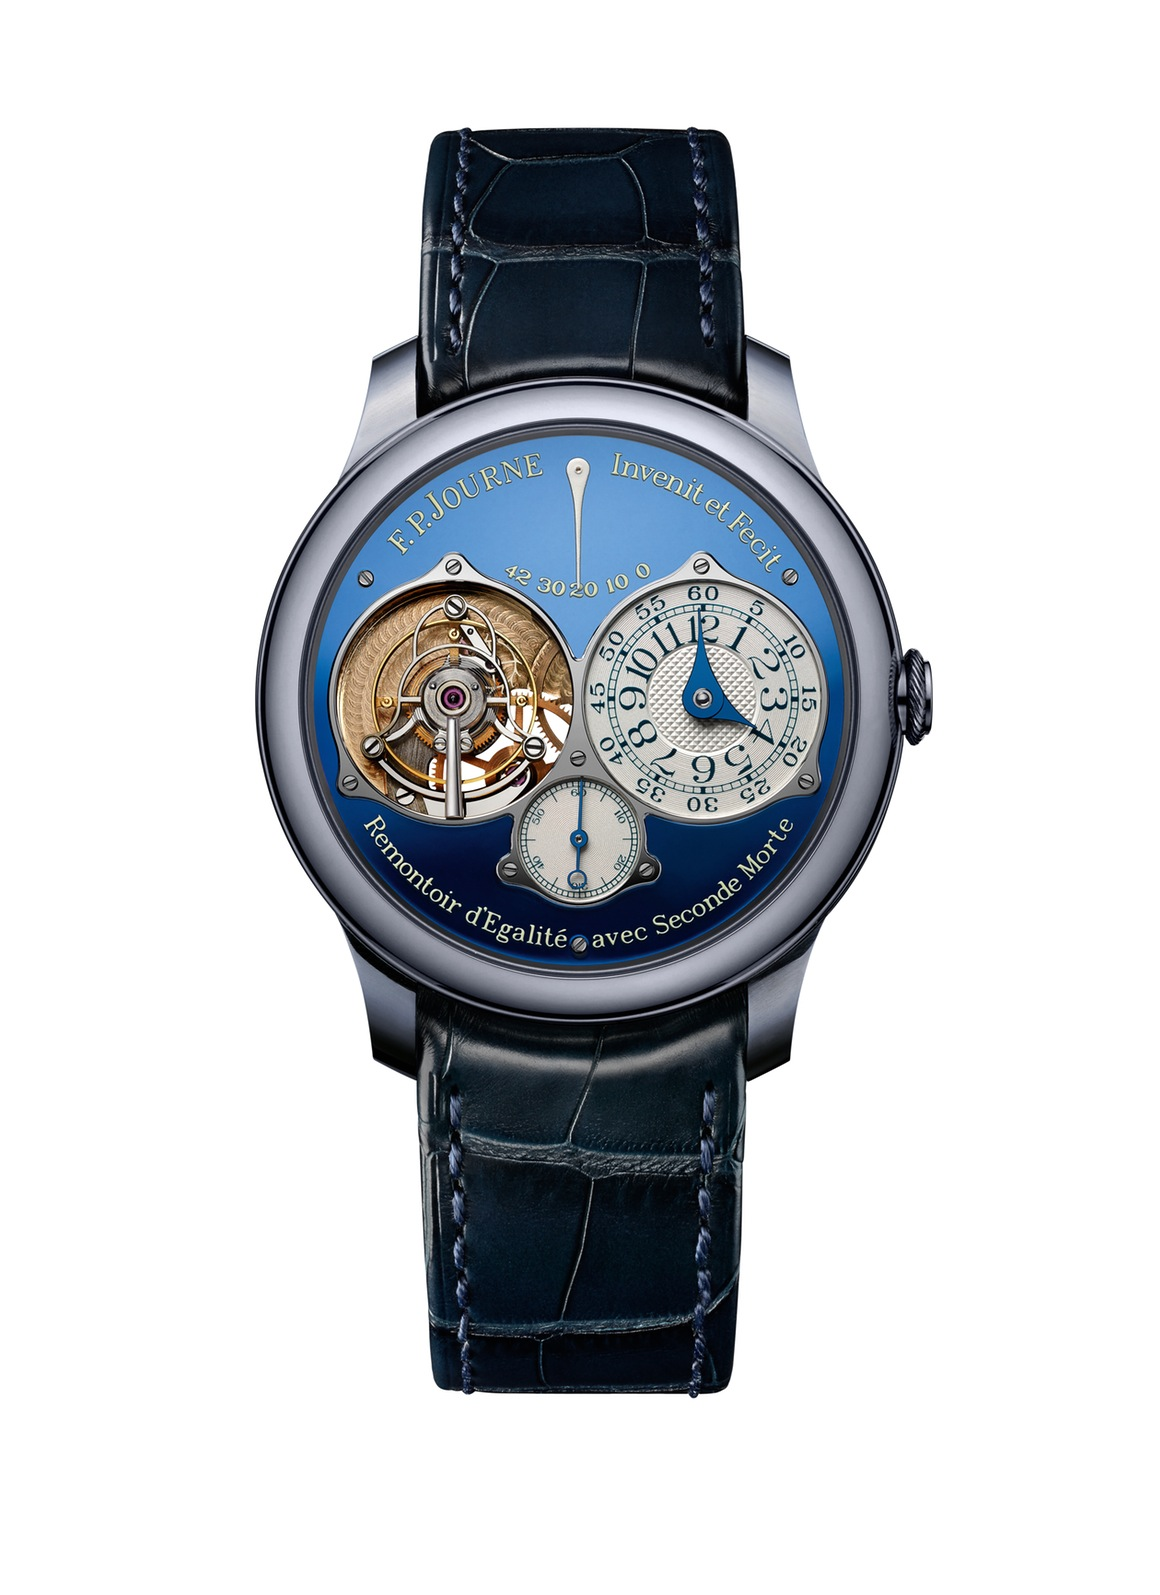 FPJourne-Tourbillon-Souverain-Bleu-only-watch-2015.jpg